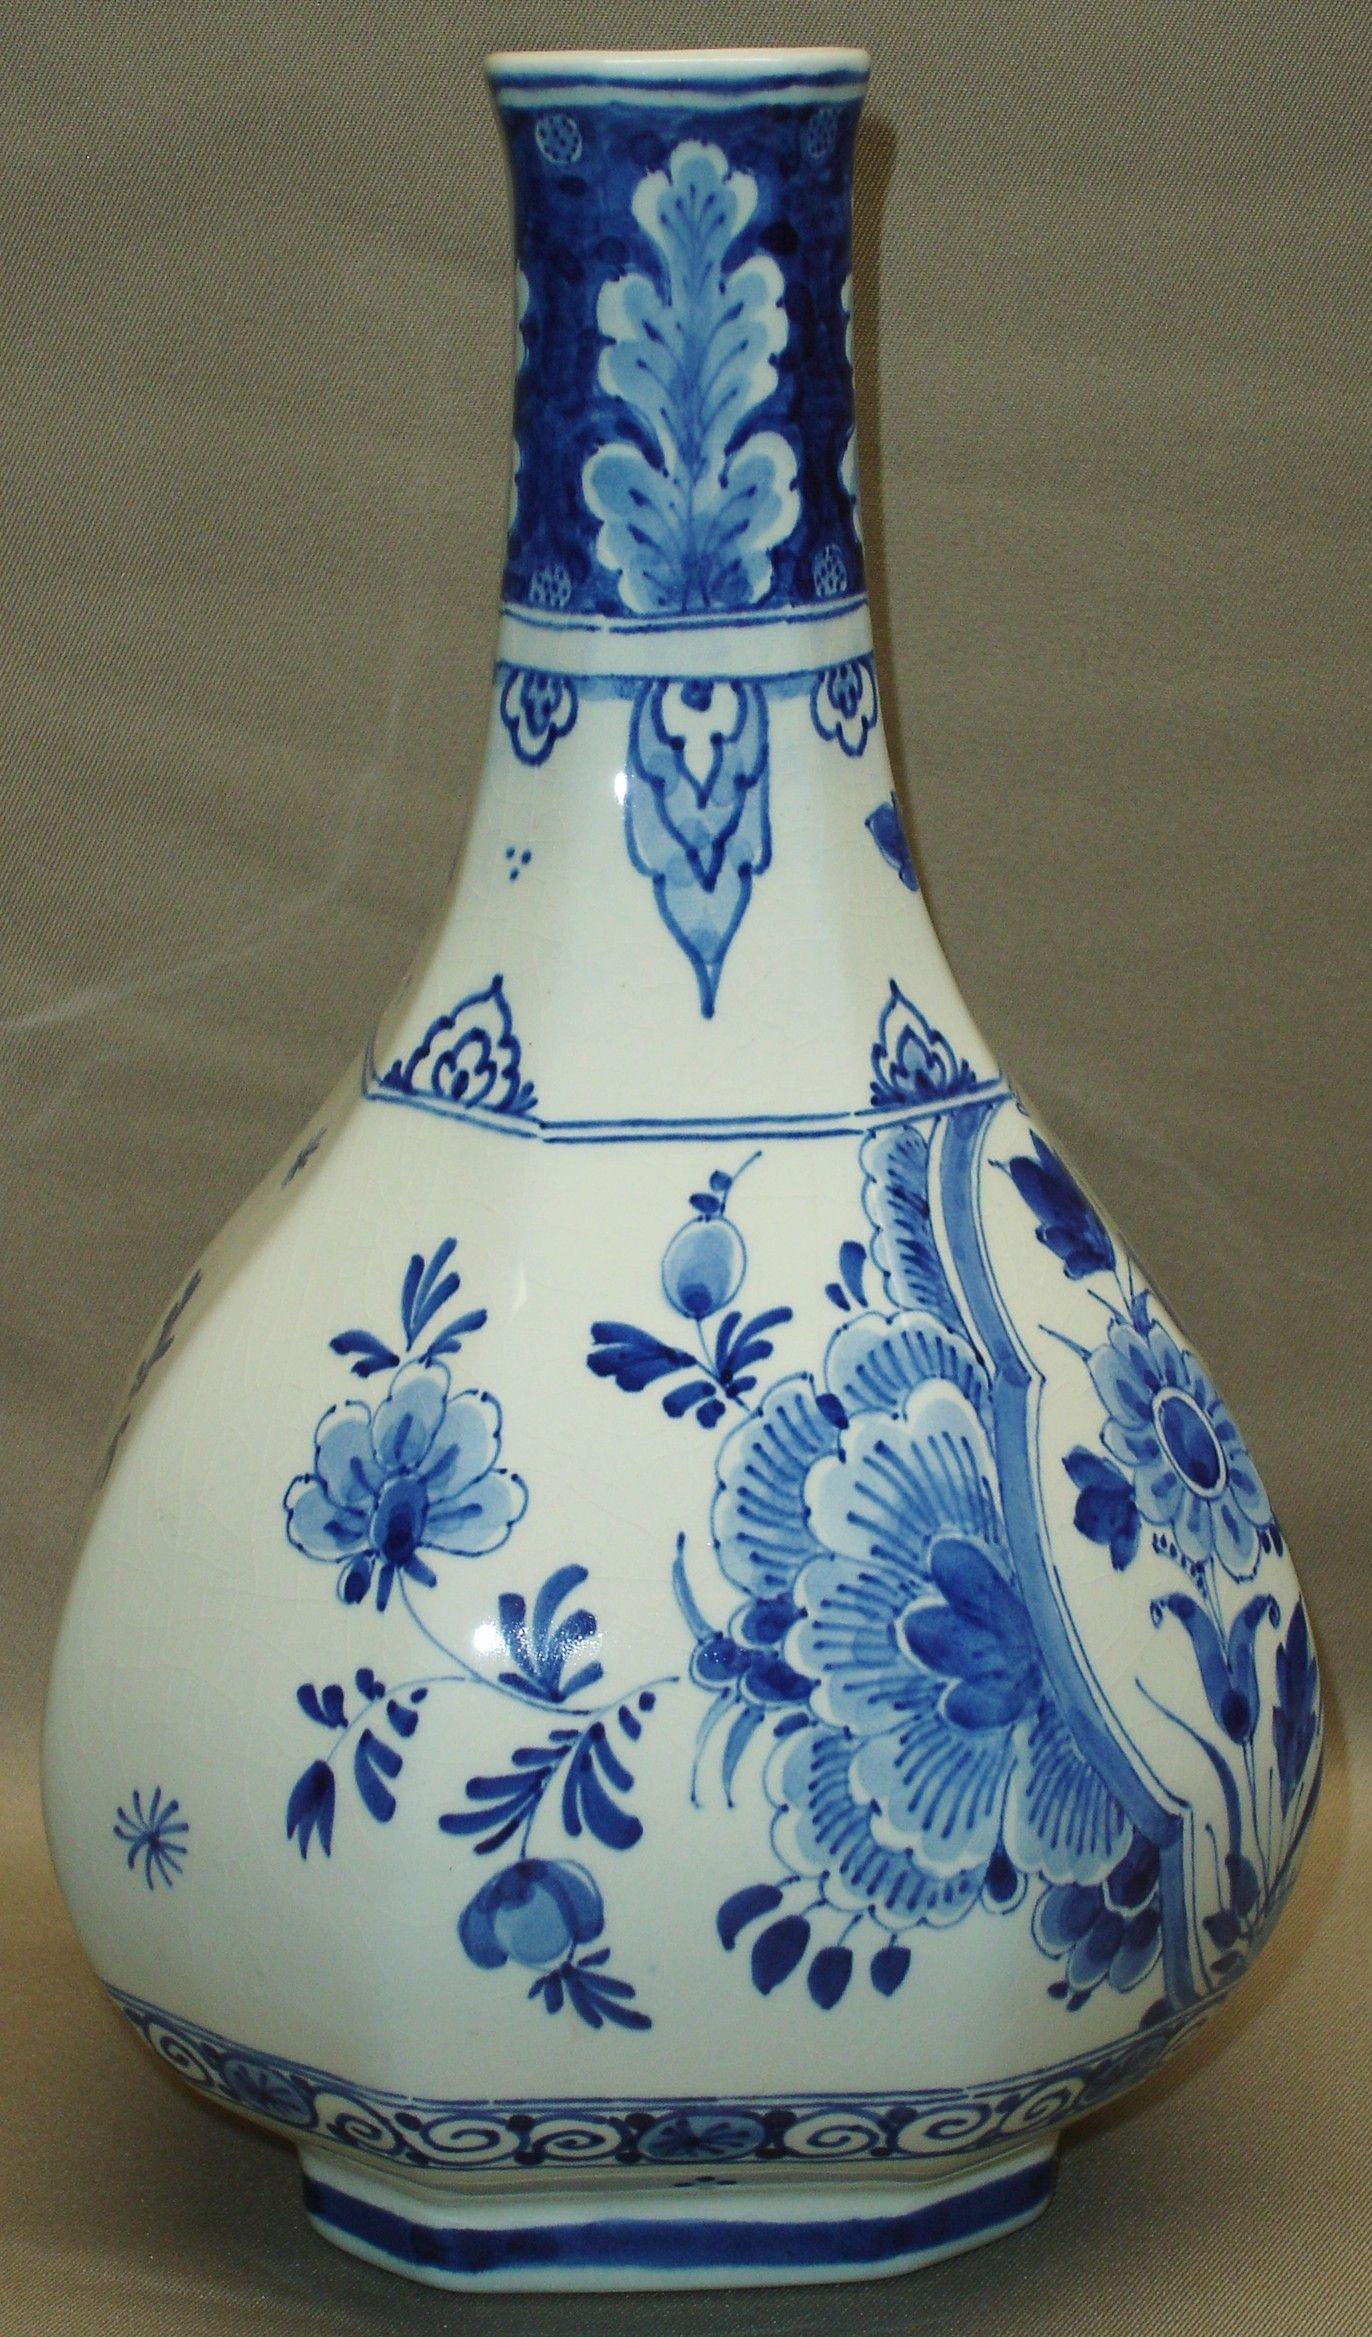 delft vase holland of delfs blauwe vaas delfts blauw pinterest delft porcelain regarding delfs blauwe vaas